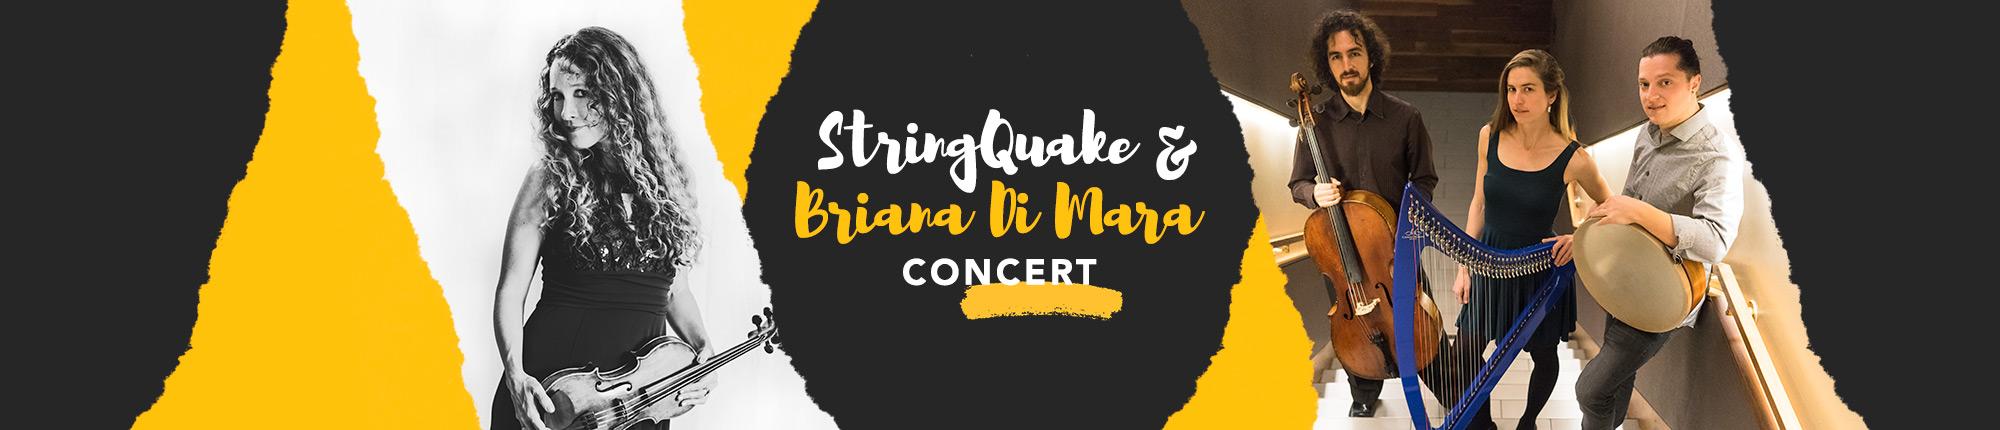 StringQuake And Briana Di Mara Concert